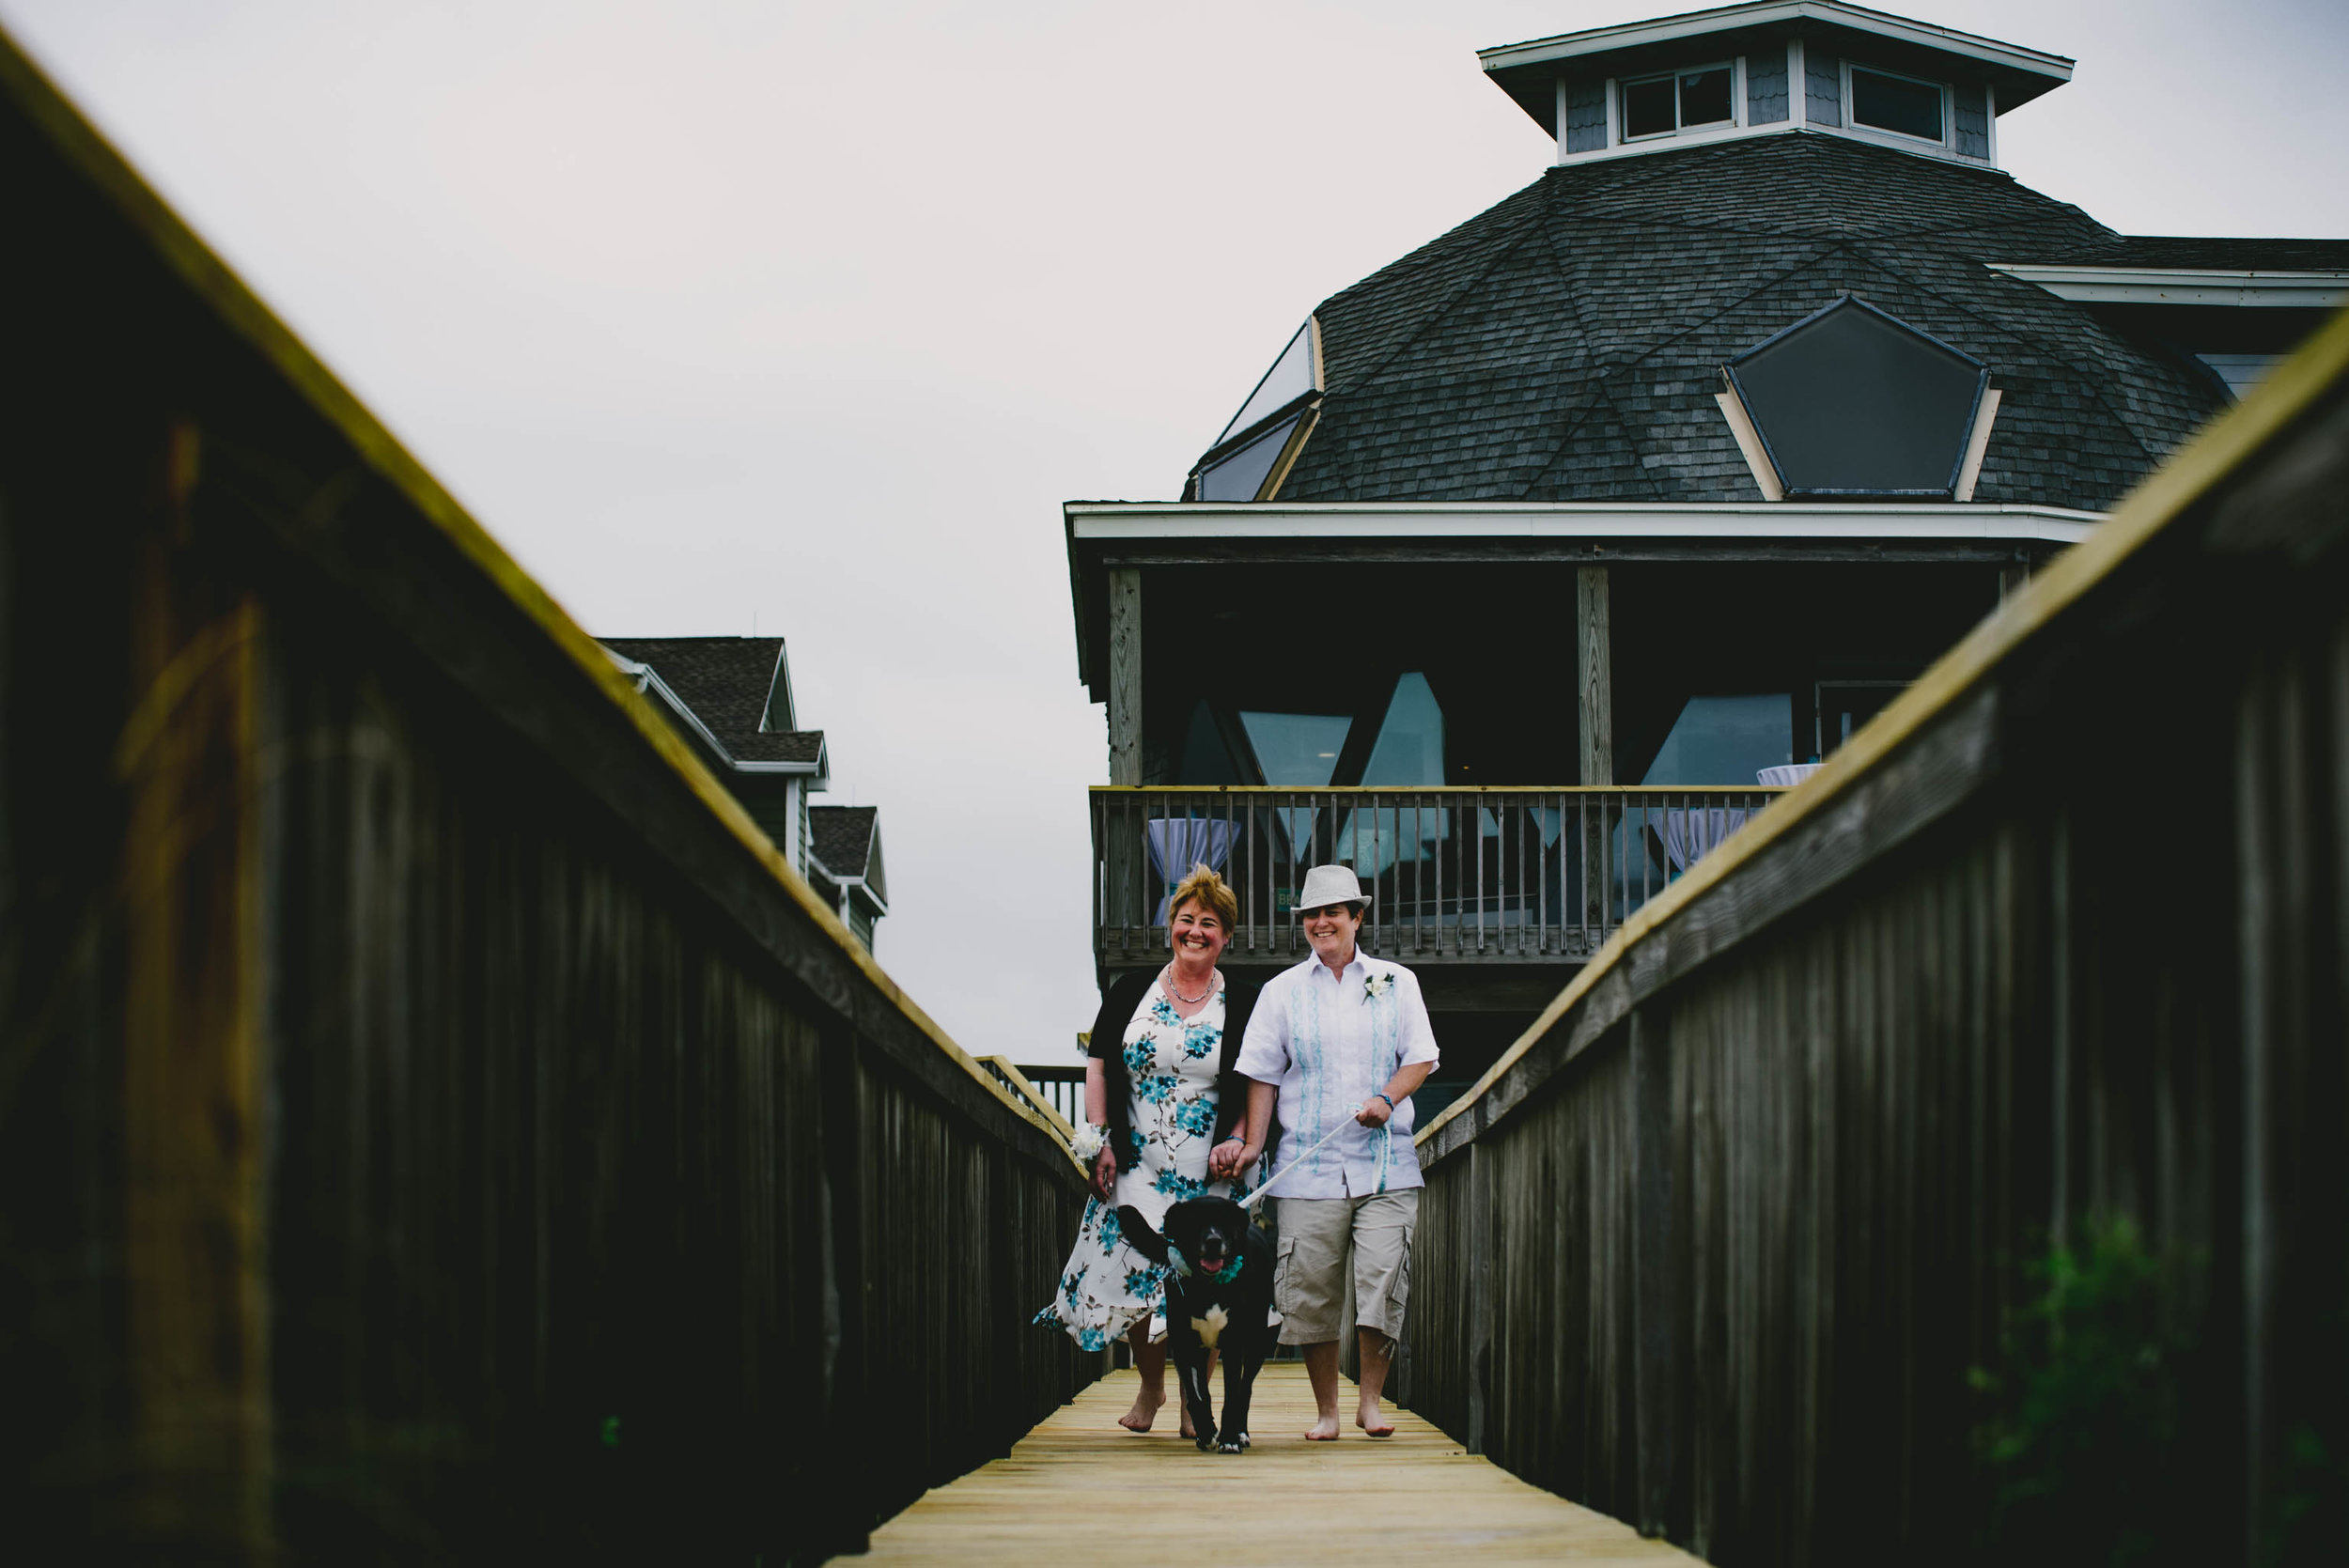 topsail-island-same-sex-beach-wedding-processional-photo.jpg